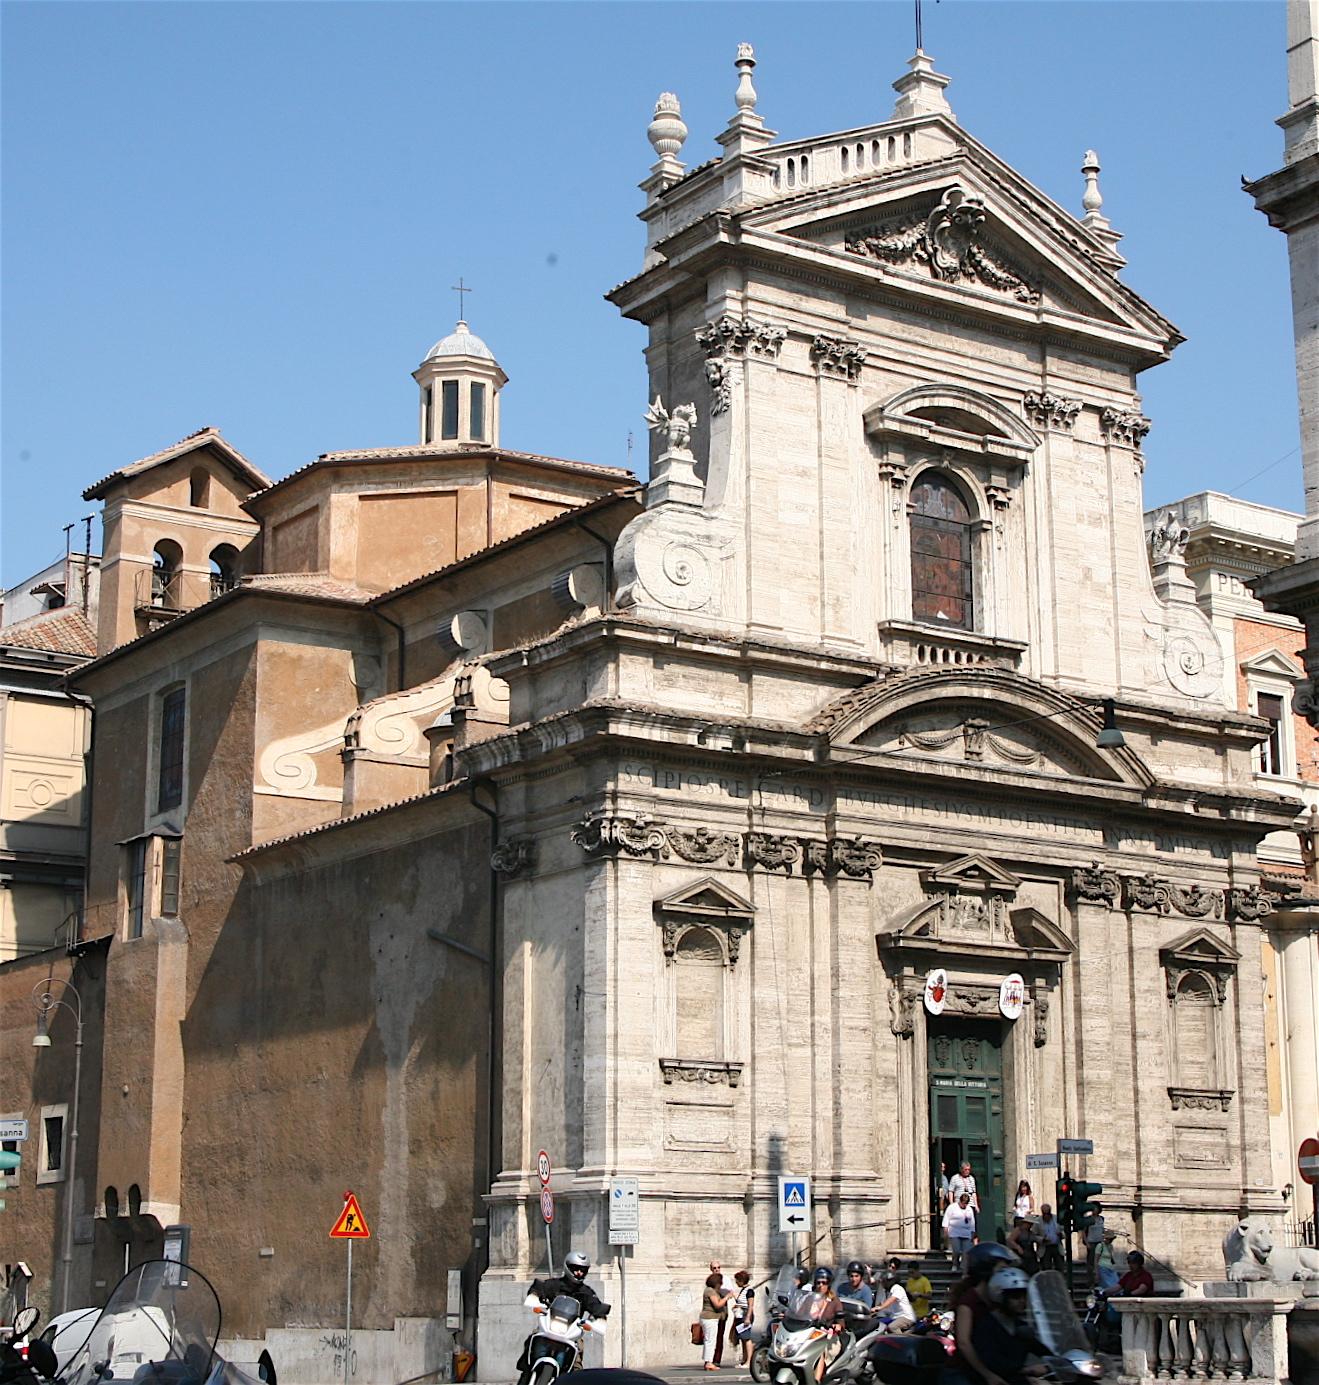 http://upload.wikimedia.org/wikipedia/commons/d/de/Santa_Maria_della_Vittoria_-_8.jpg